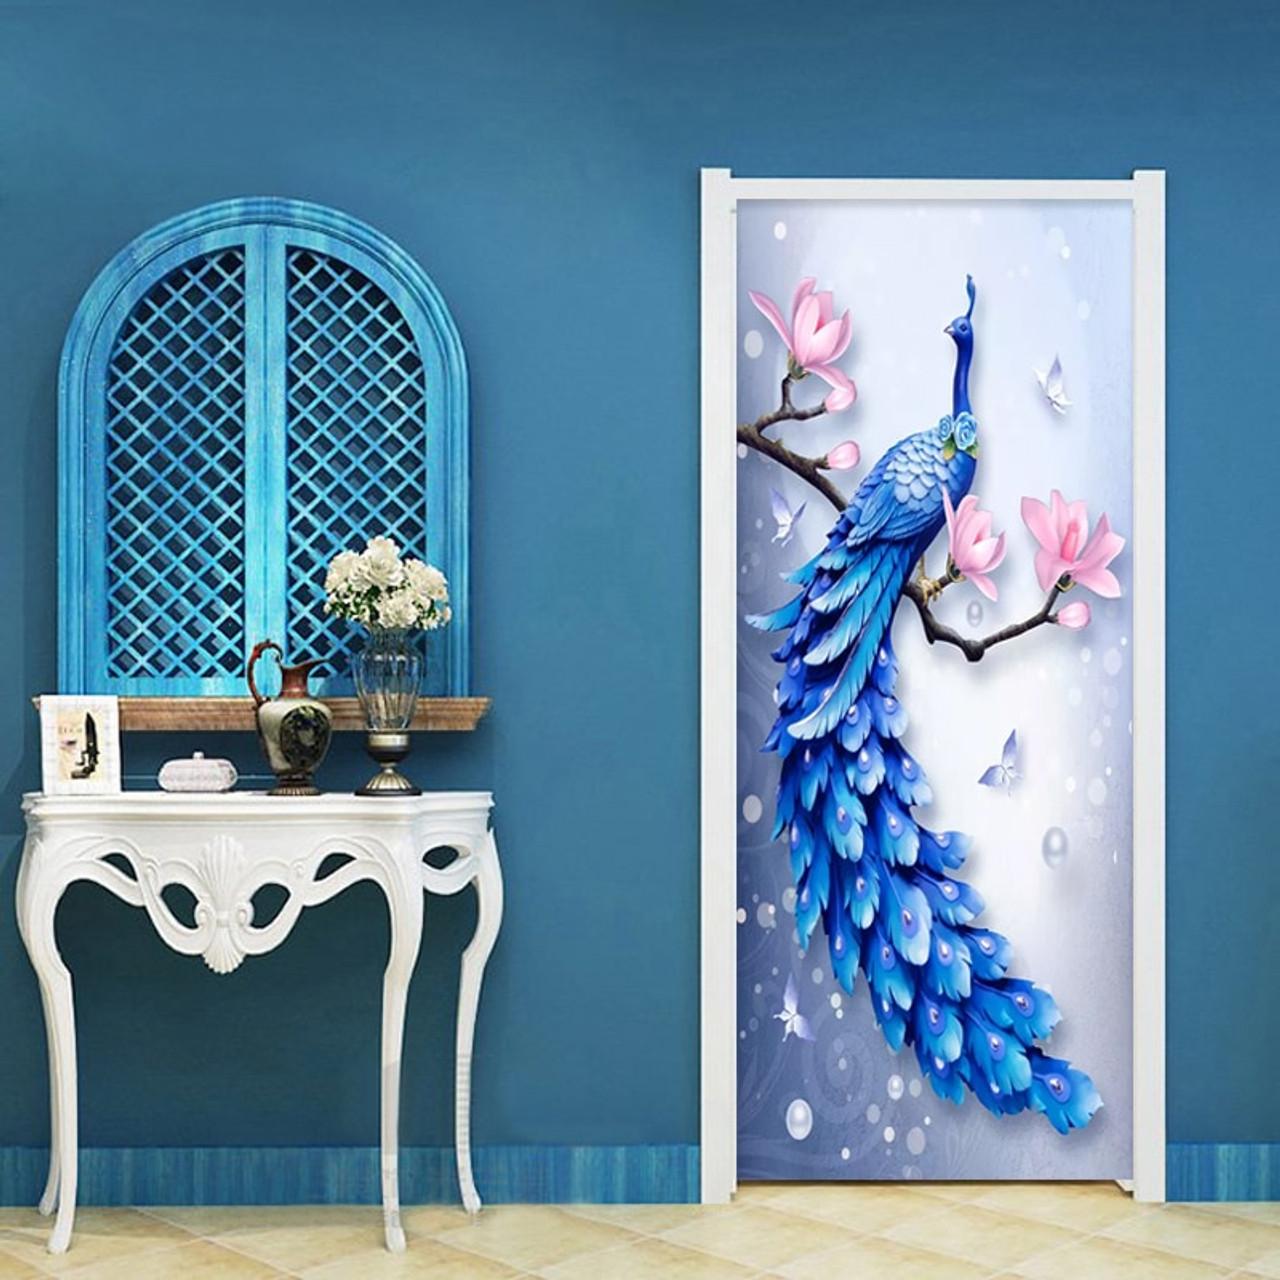 3d Stereo Relief Blue Peacock Photo Murals Wallpaper Living Room Bedroom Study Door Sticker Pvc Waterproof Wall Paper Home Decor Onshopdeals Com